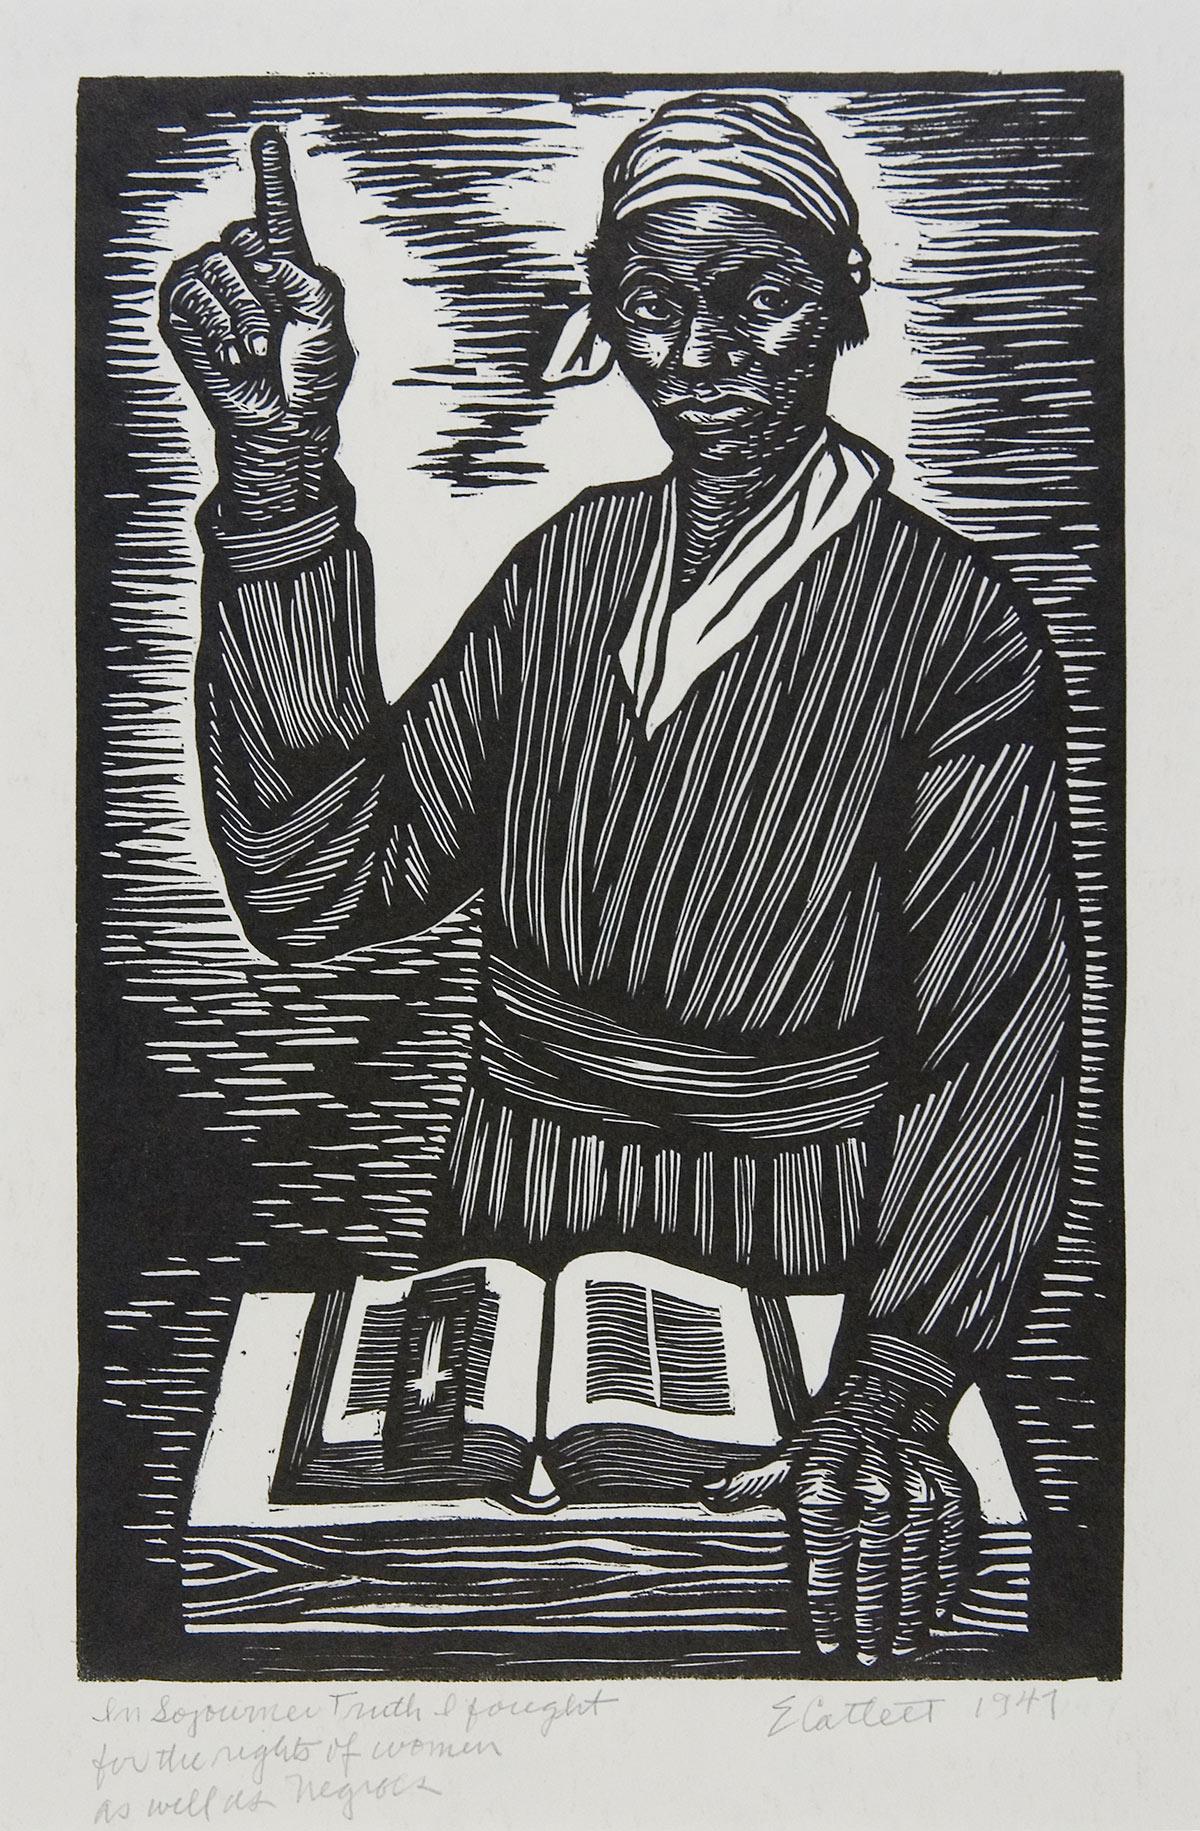 In Sojourner Truth Linoleum block print